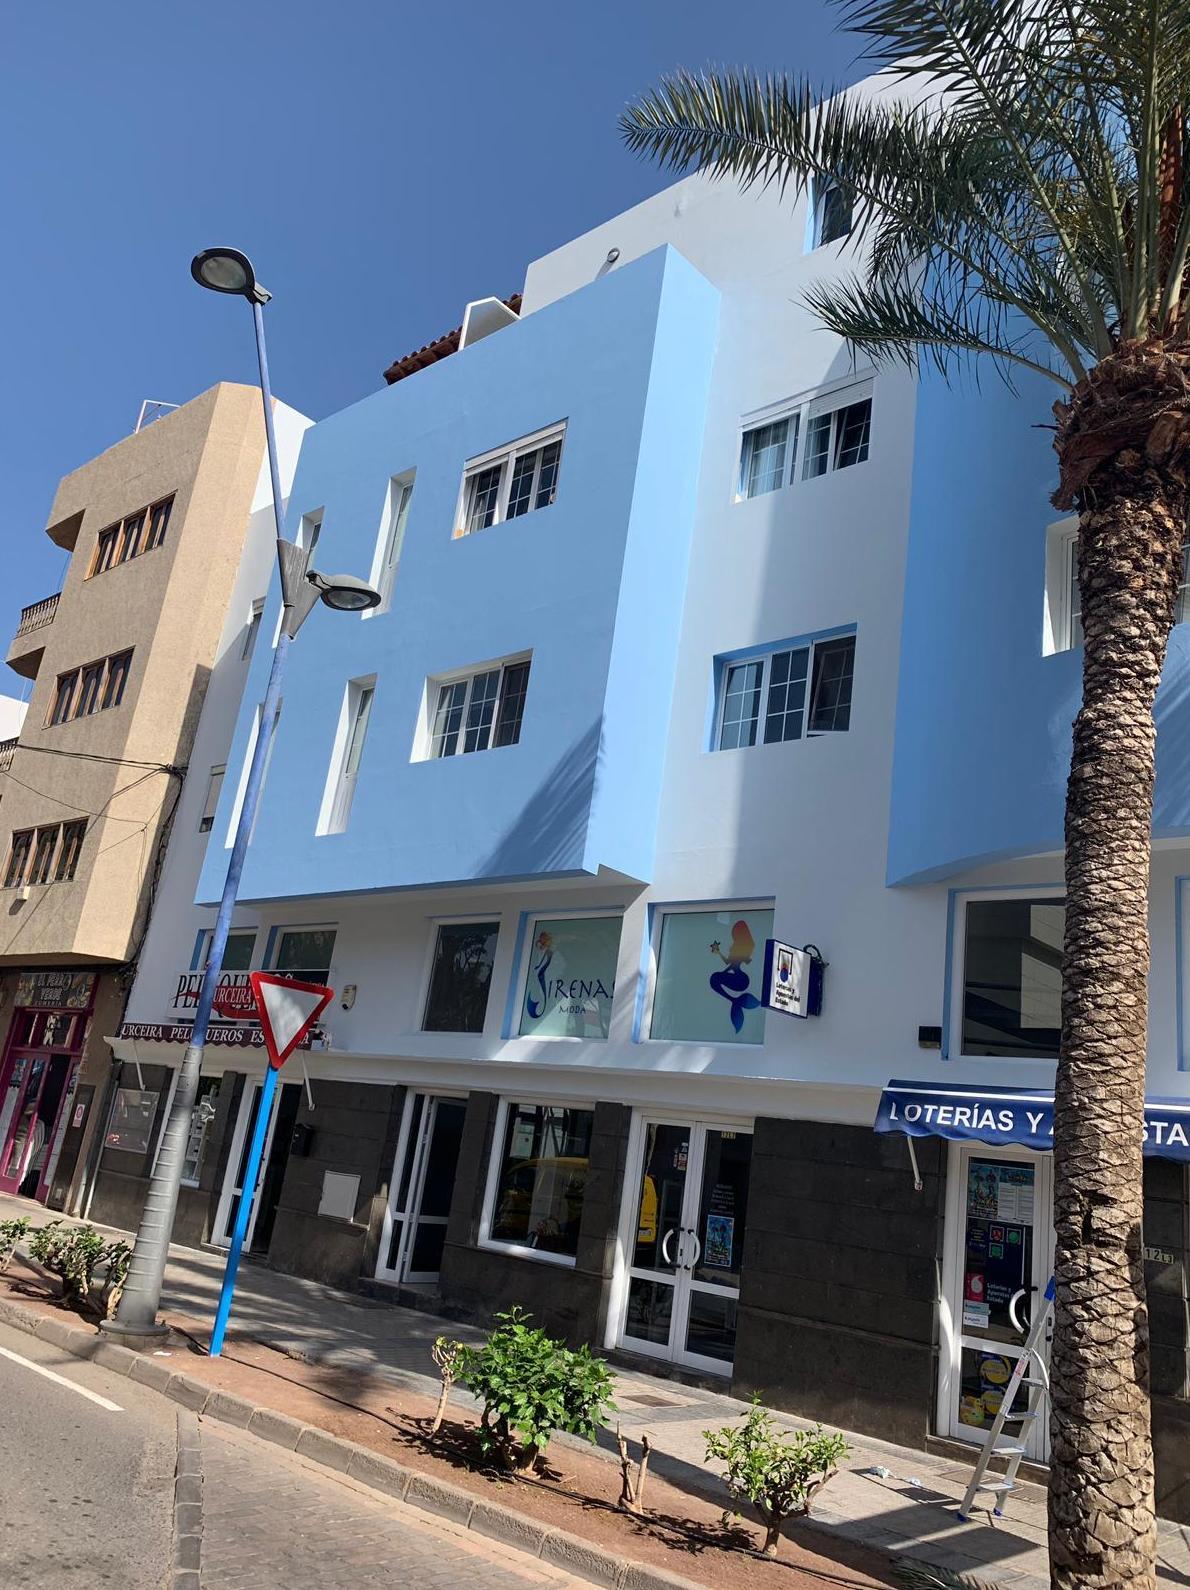 Gran Tarajal, TUINEJE, Fuerteventura